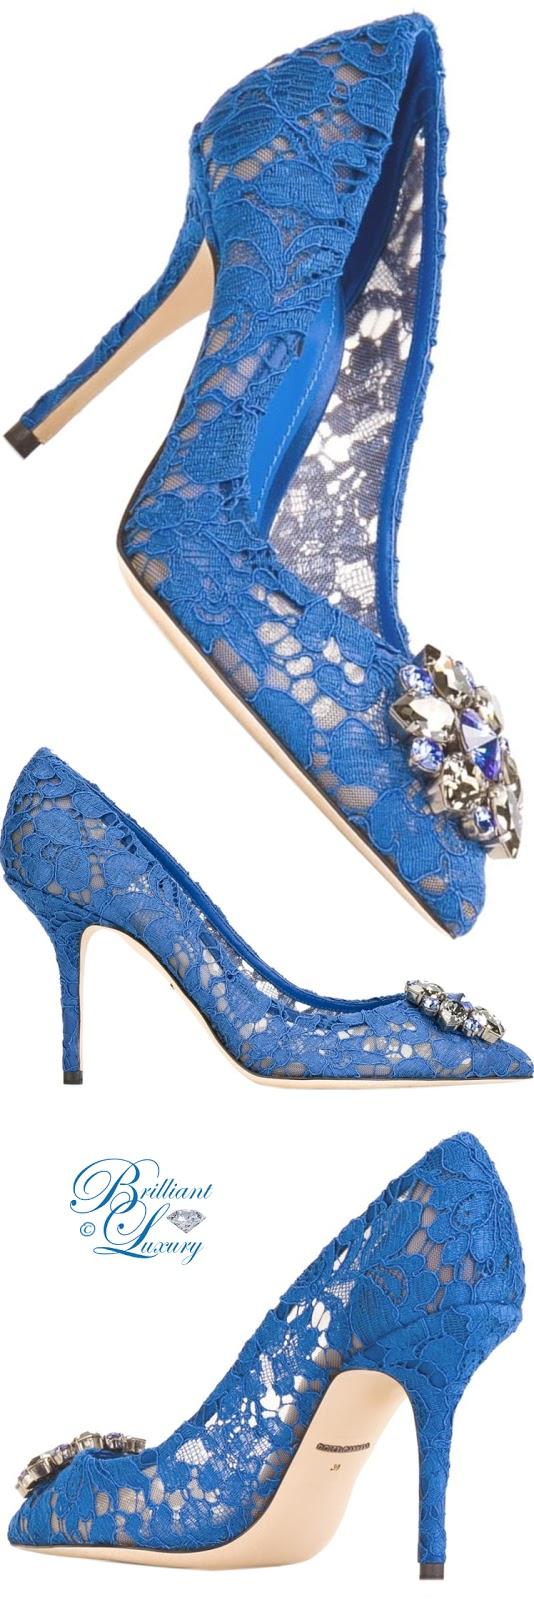 Brilliant Luxury ♦ Dolce & Gabbana Belluci Pumps